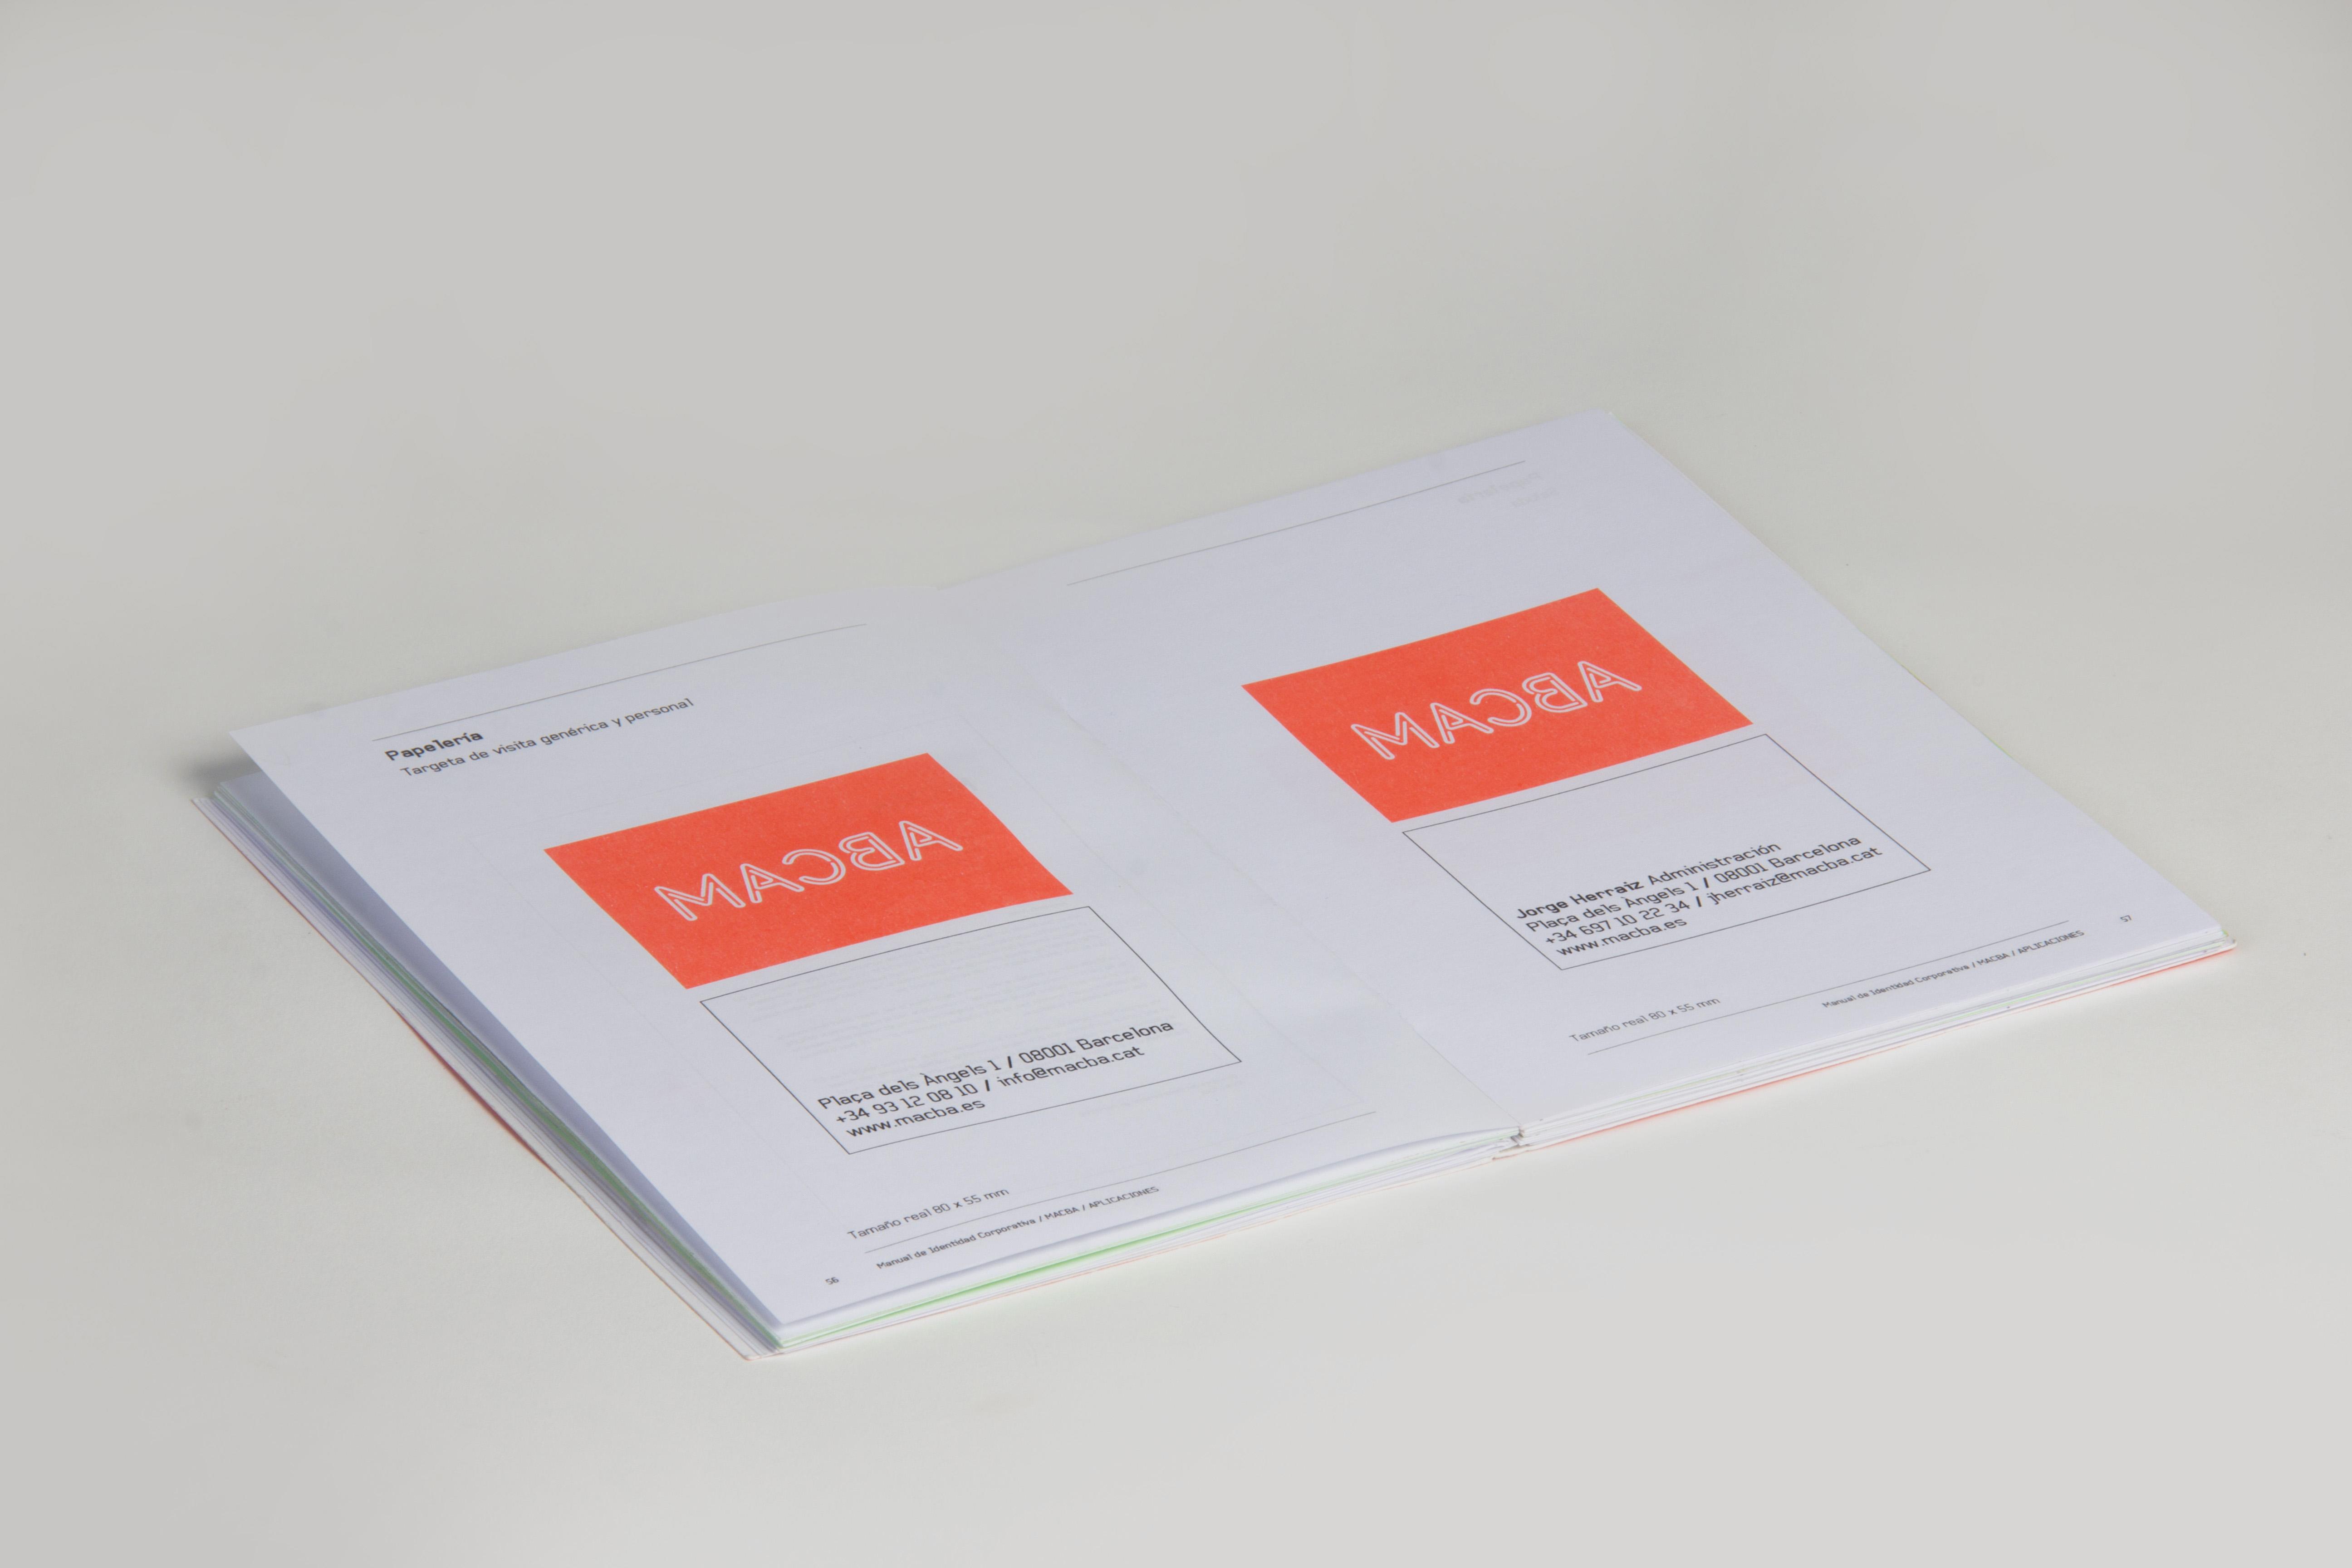 img_0762-copy